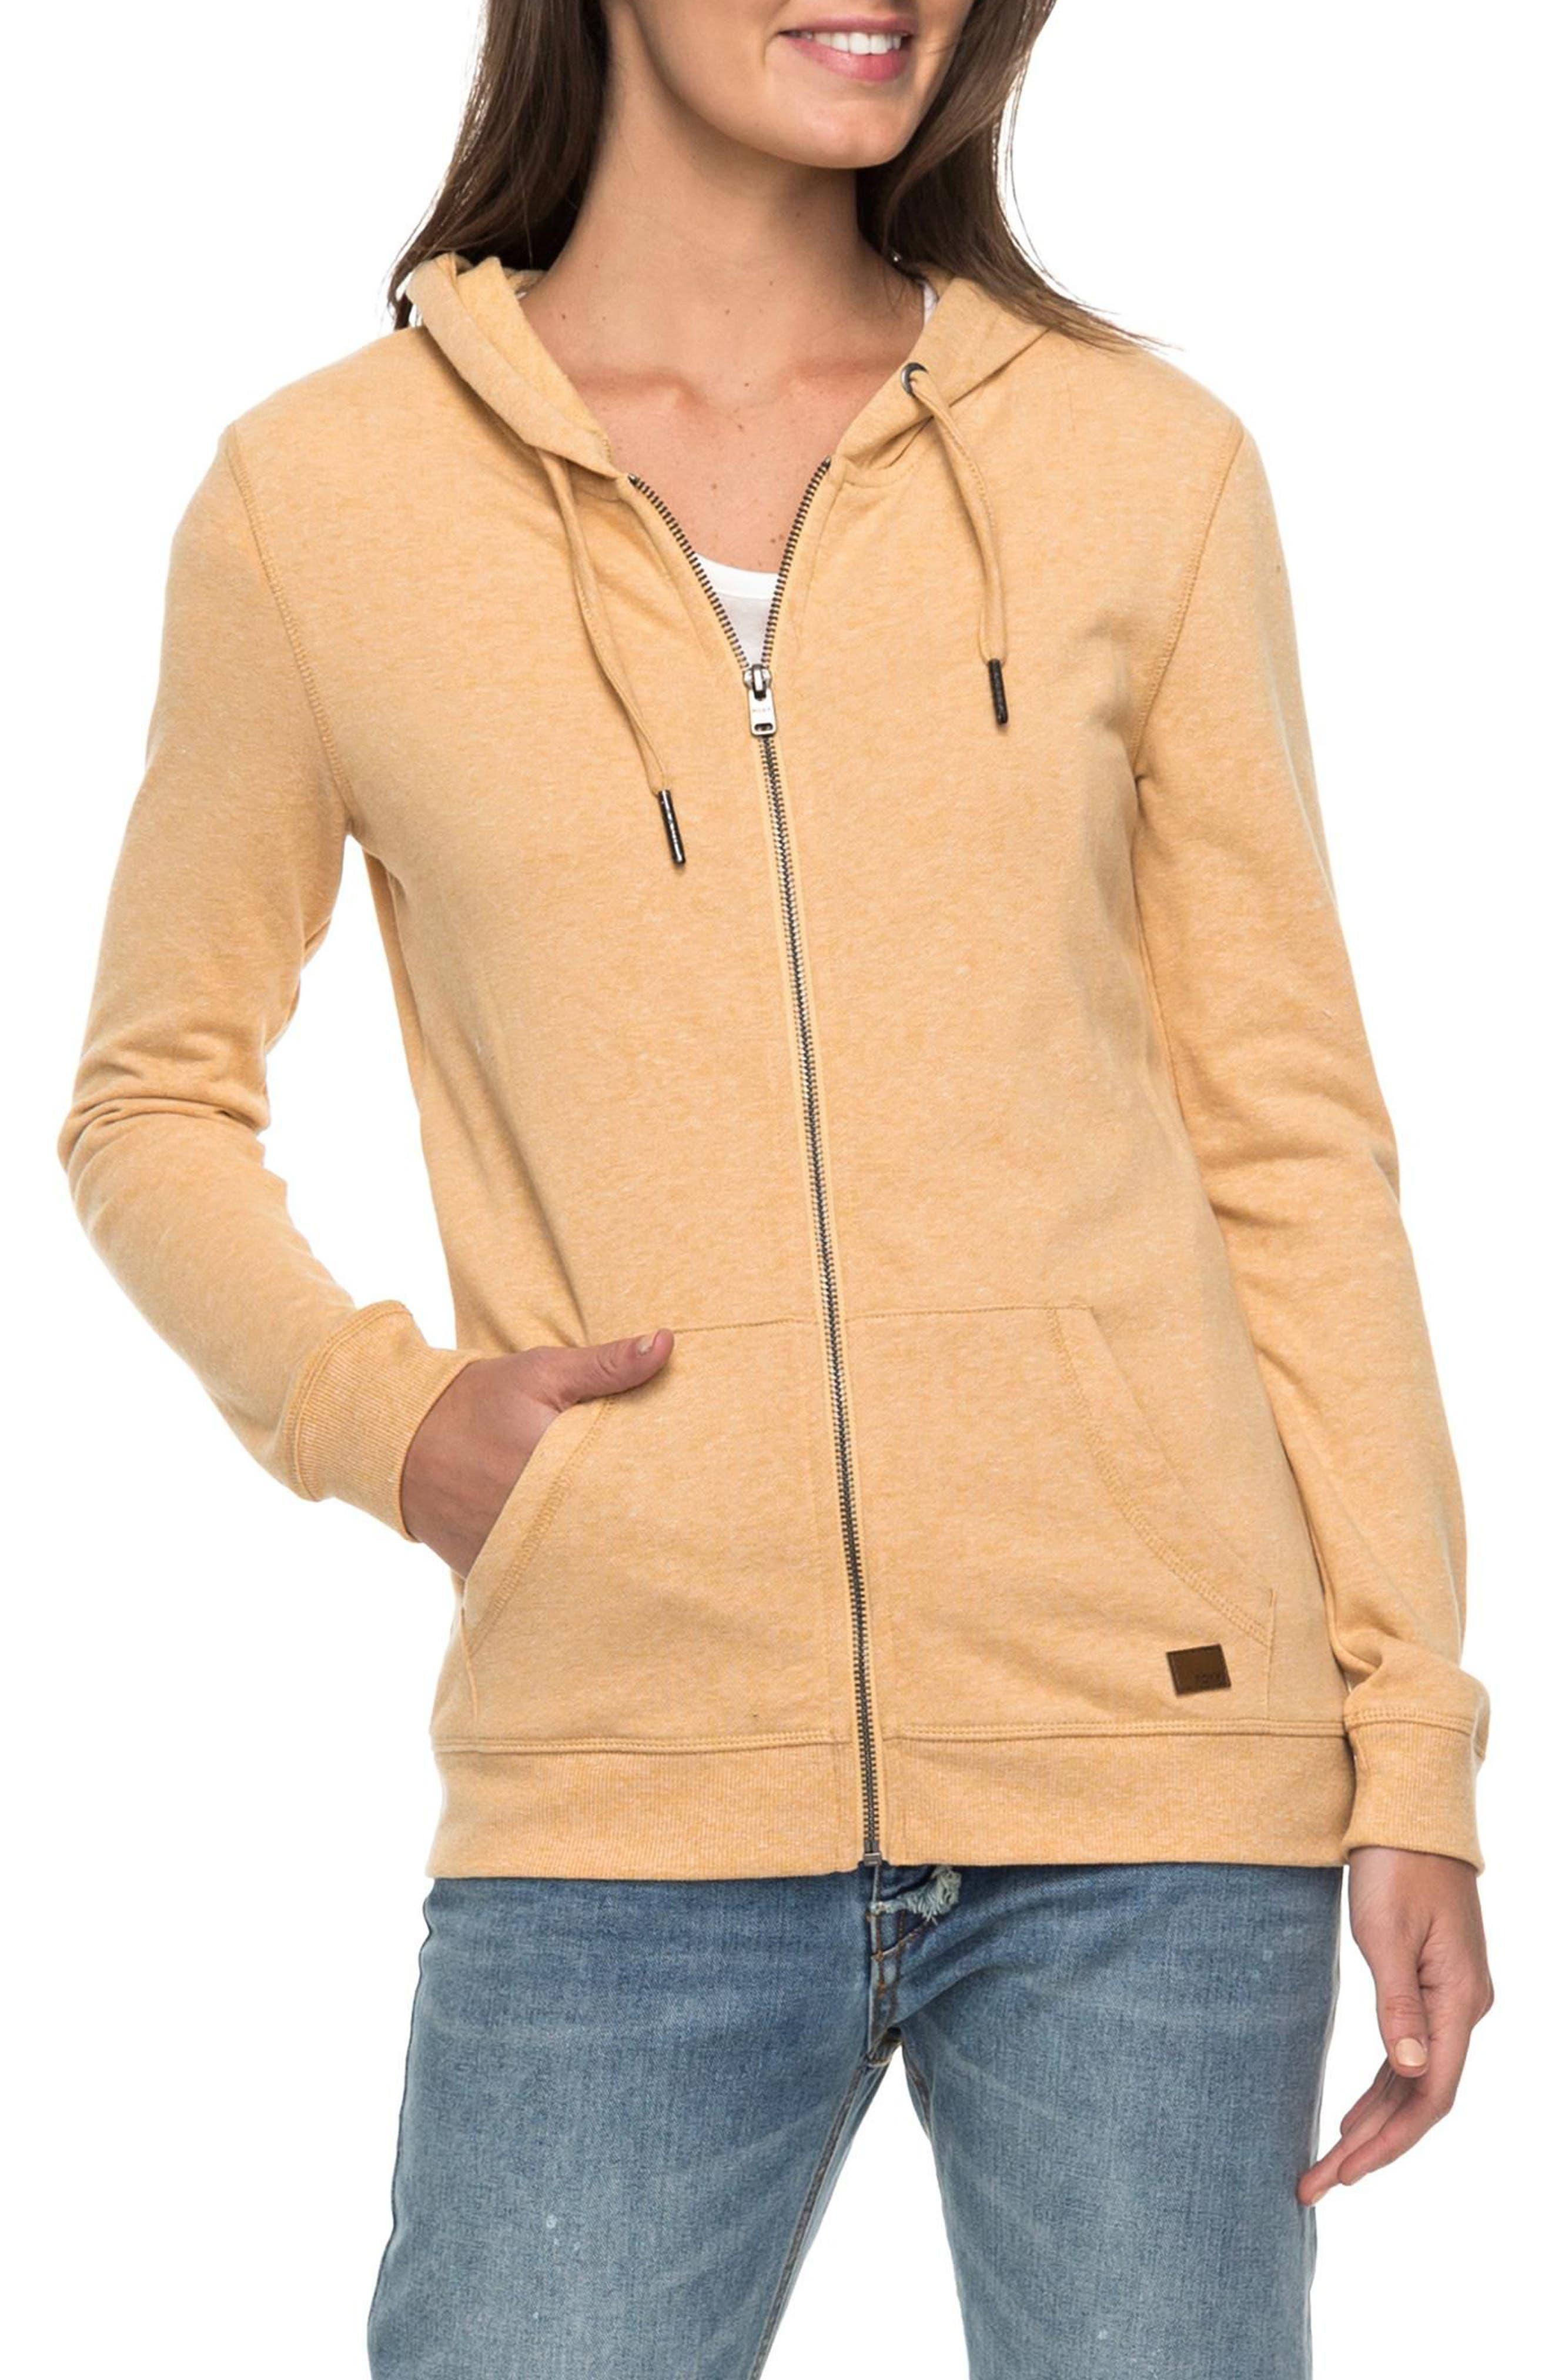 Trippin Hoodie,                         Main,                         color, Buff Yellow Heather